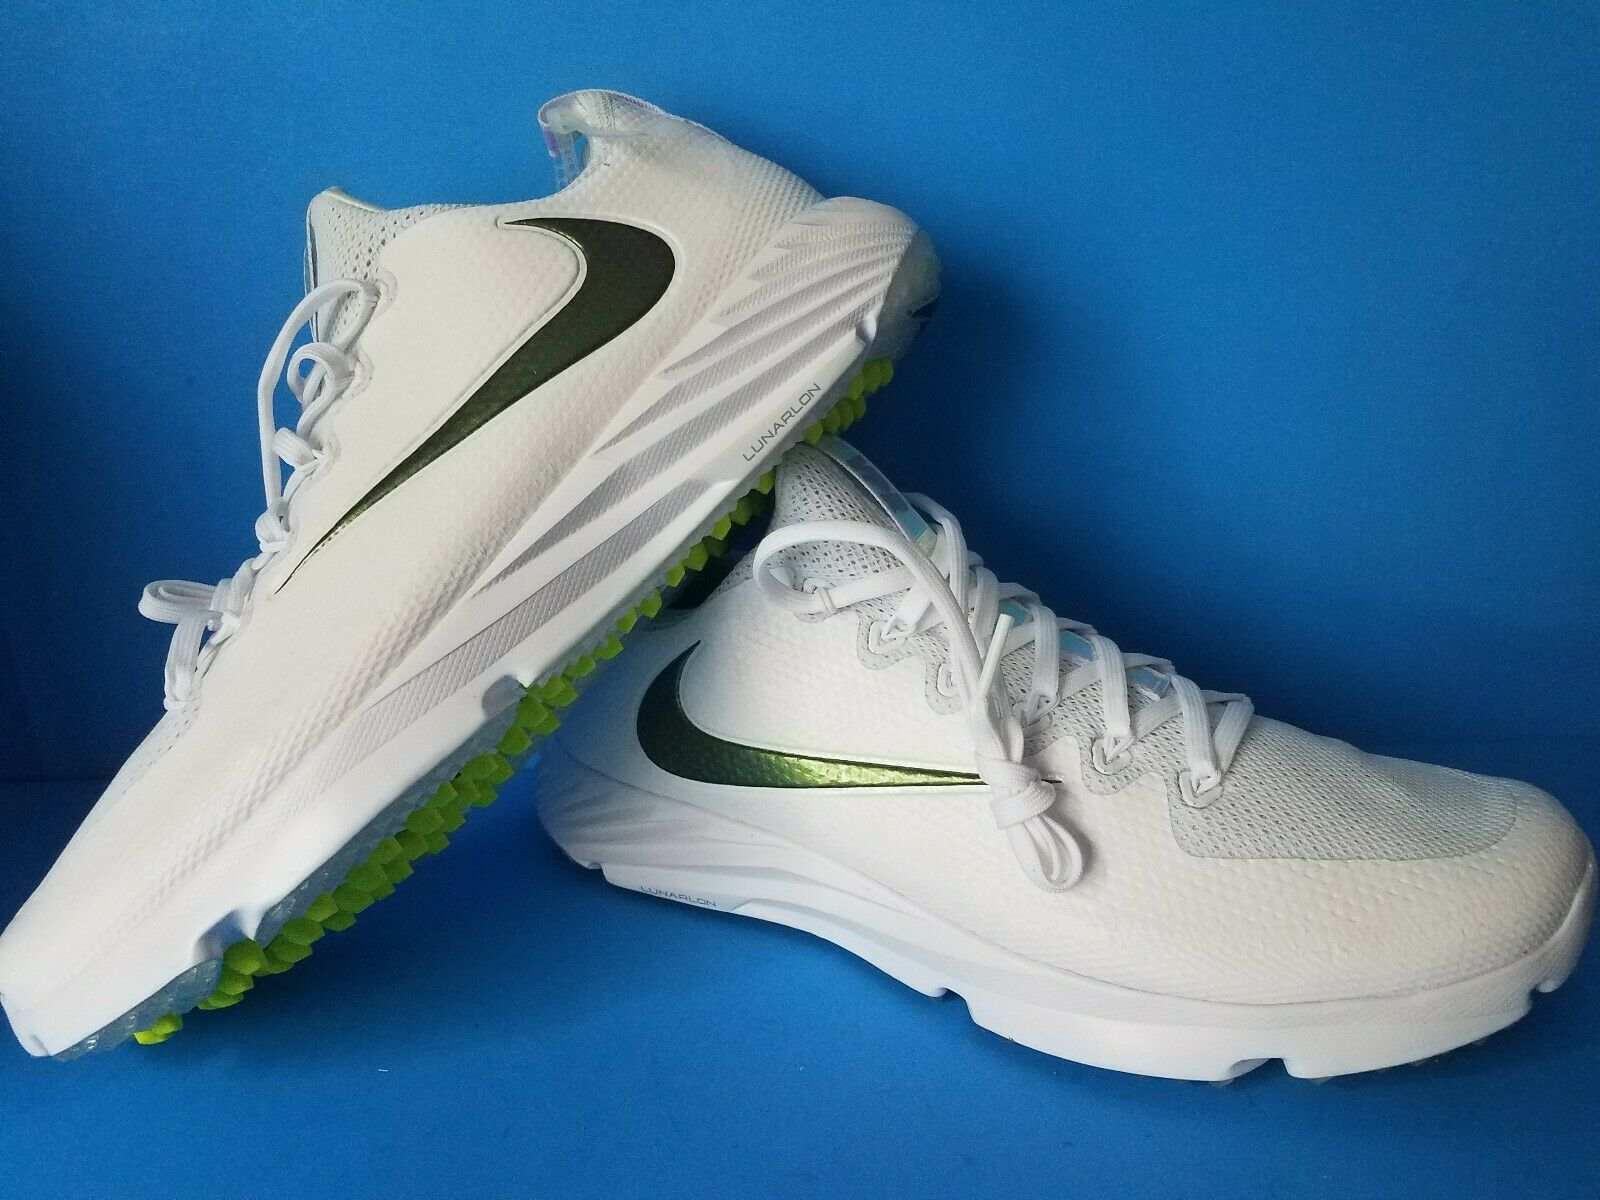 Nike Vapor Speed Turf Trainer Superbowl LII White 833408-112 Size 10 1 2 NICE